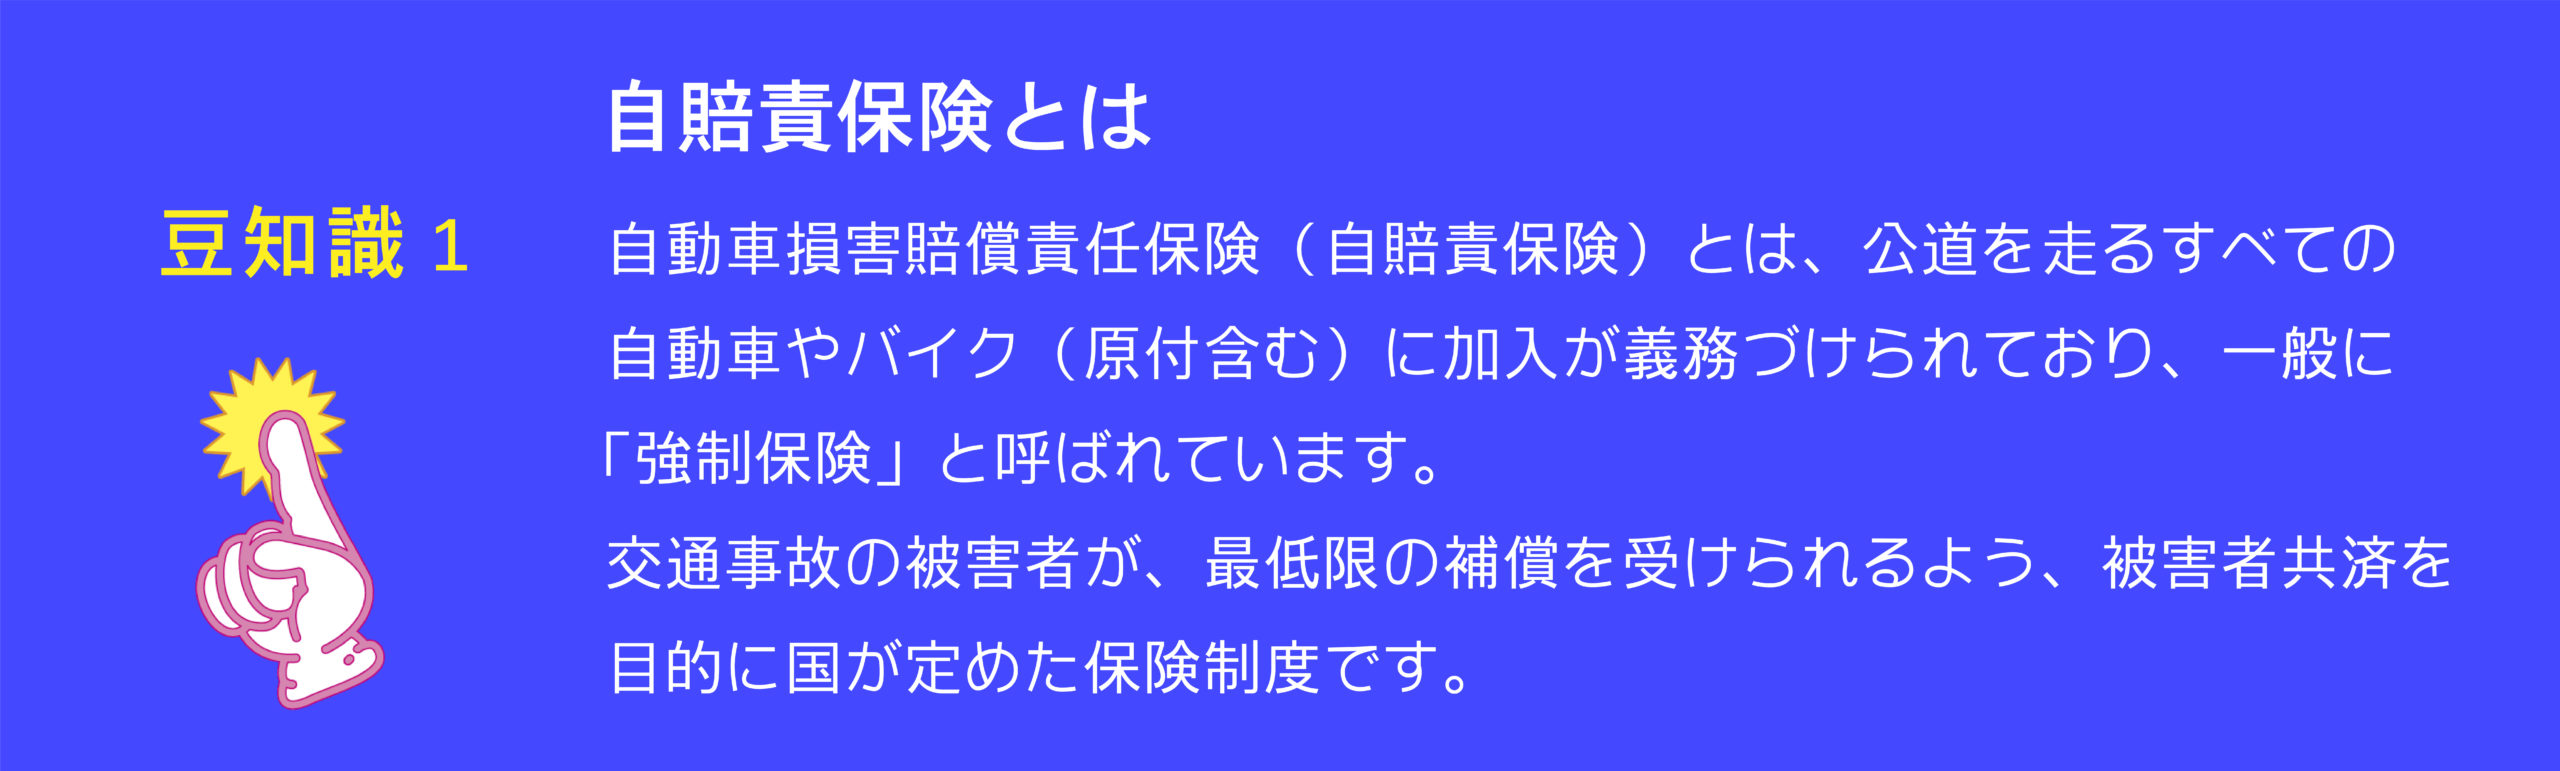 mamethishiki1 01 scaled - 交通事故治療について